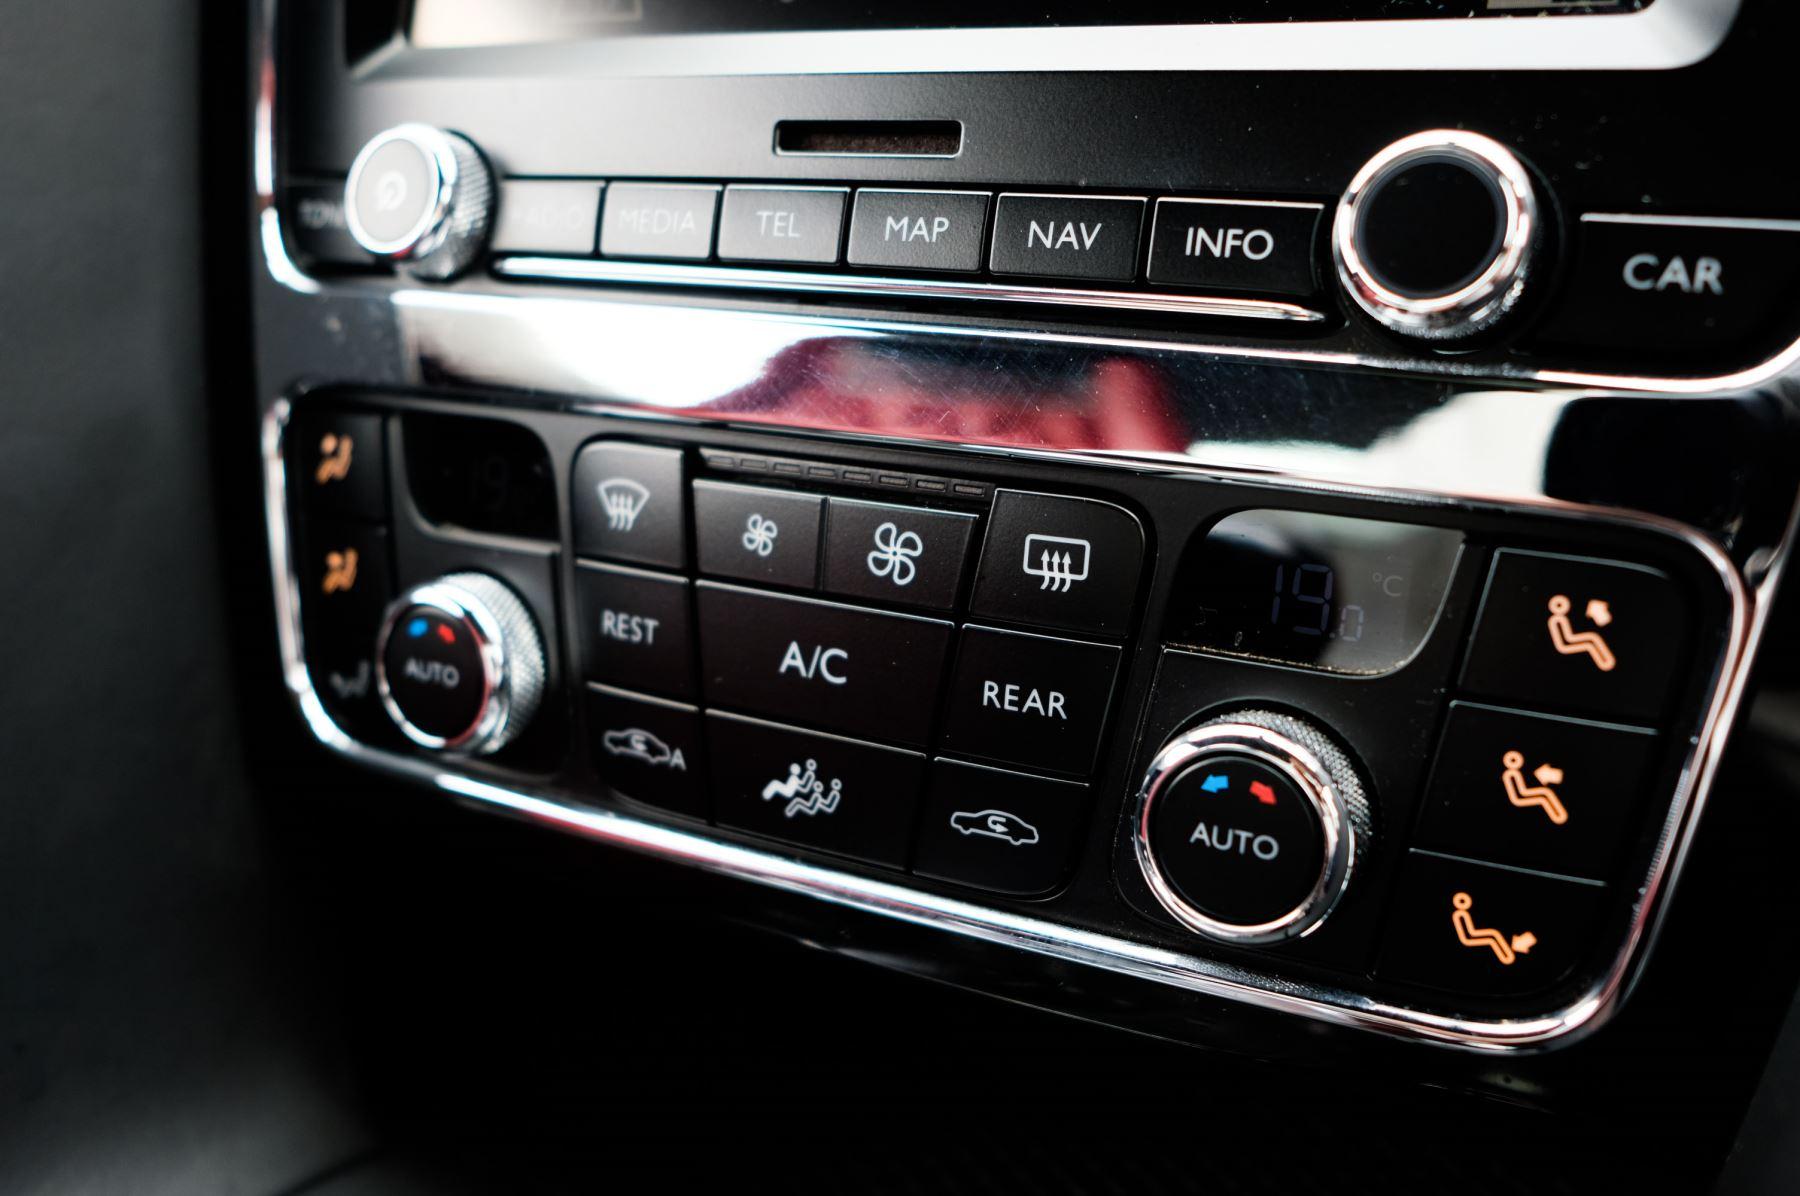 Bentley Continental GTC 6.0 W12 Speed - Massage Seats & Ventilation - Neck Warmer - Rear View Camera image 22